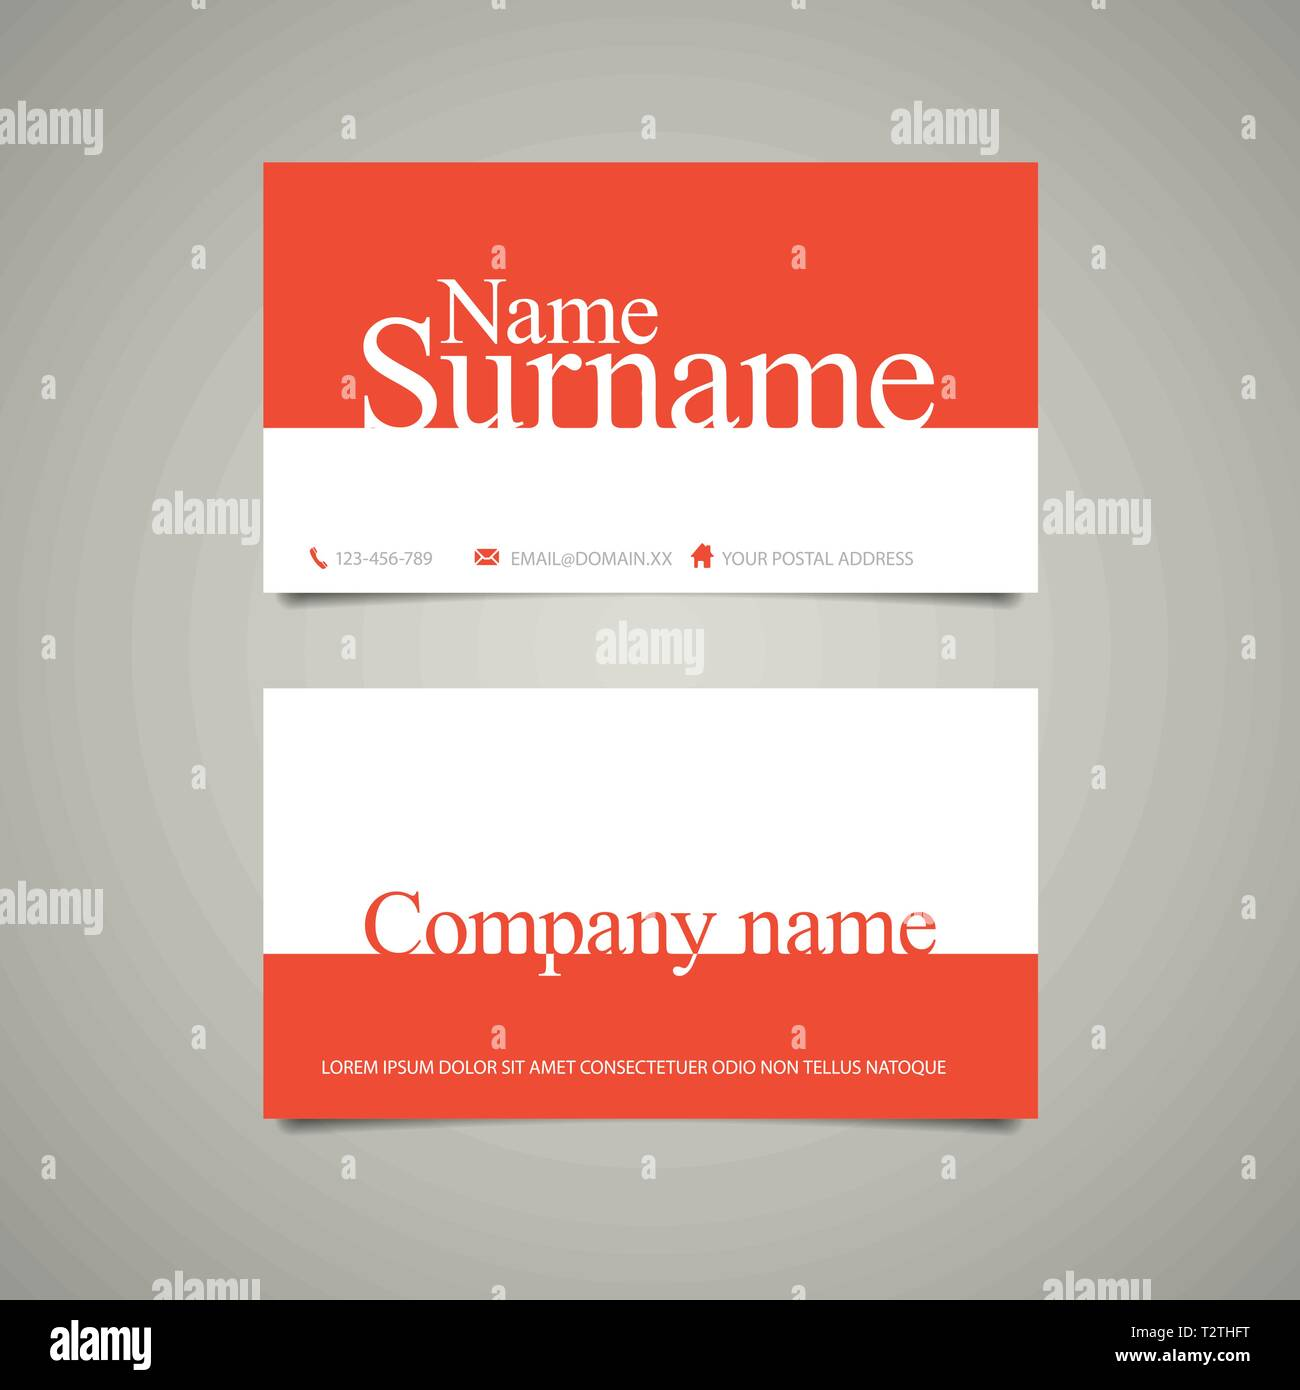 Vorname Familienname Stockfotos Vorname Familienname